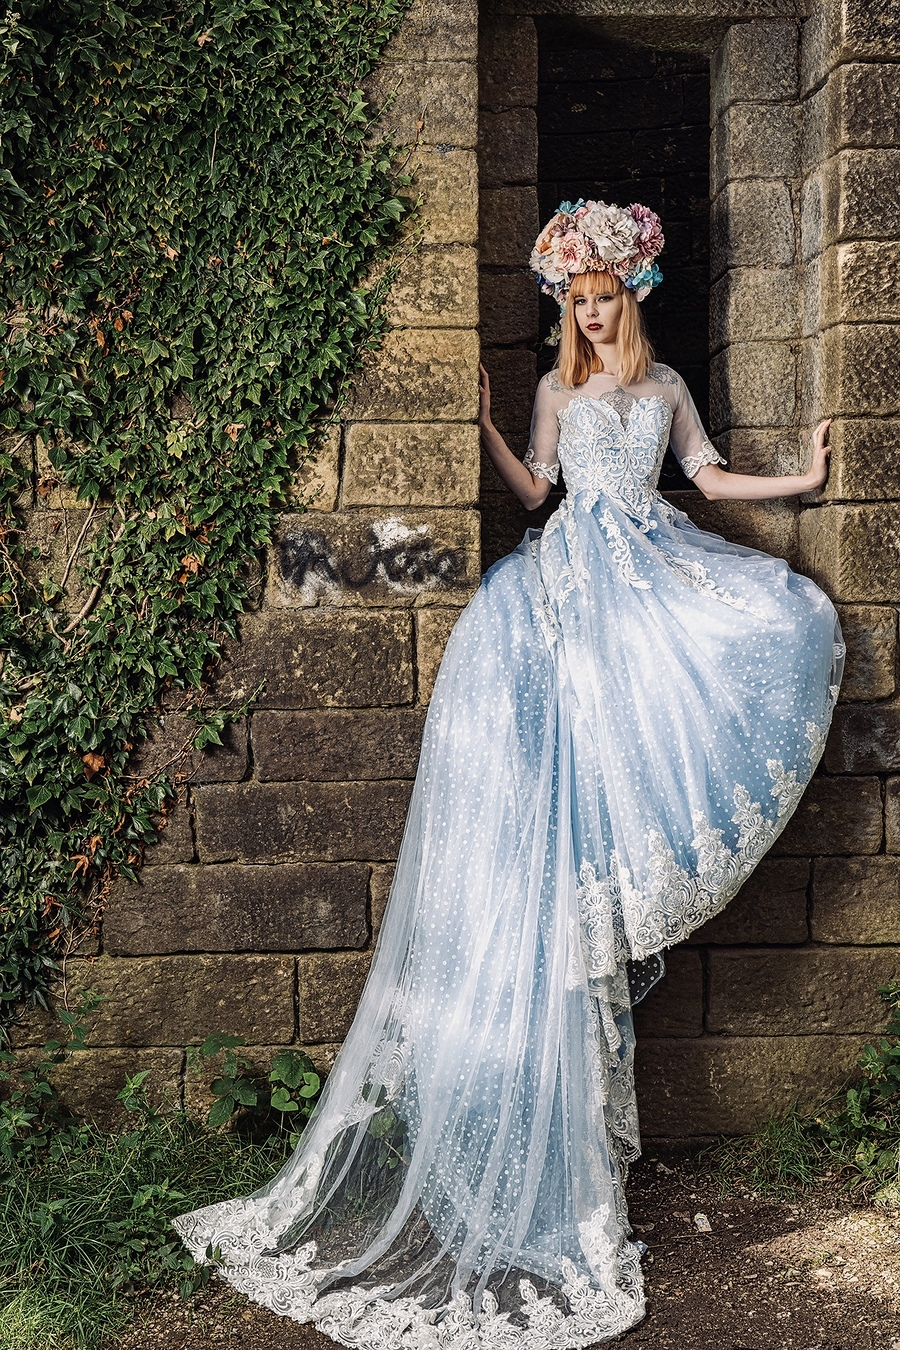 Photography by Ian M, Model Paige lauren, Stylist Tabitha Boydell - Stylist / Uploaded 5th September 2019 @ 05:20 PM